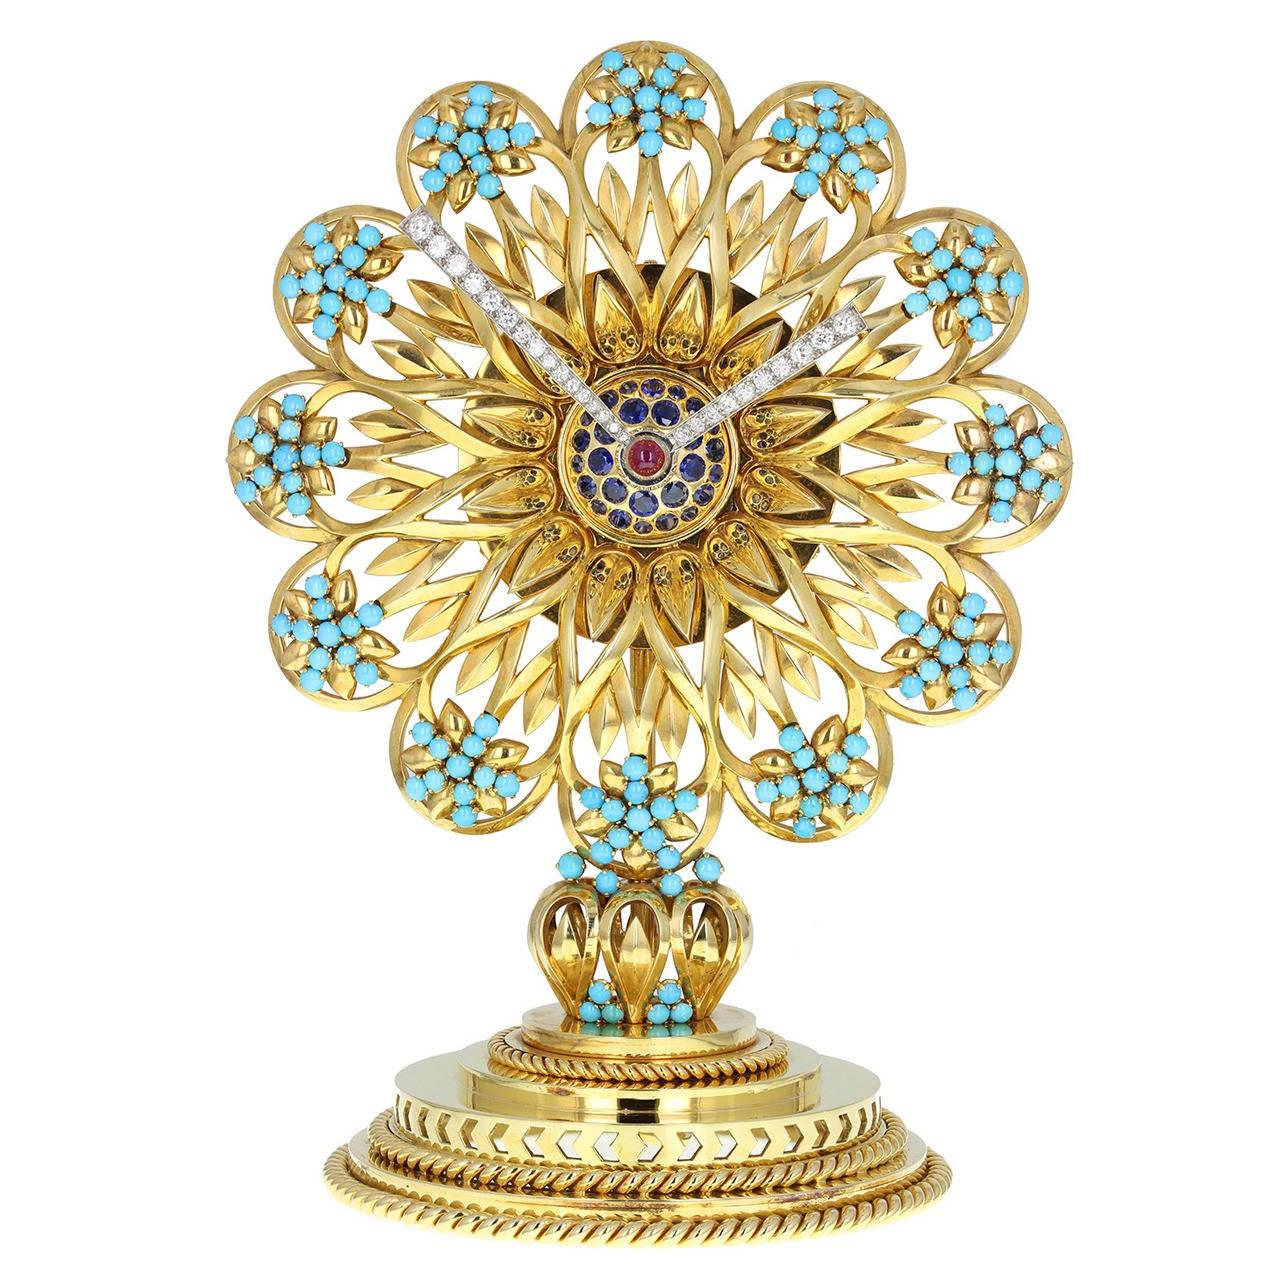 Important Boucheron Imperial Iranian Presentation Gem Set Gold Clock 1955